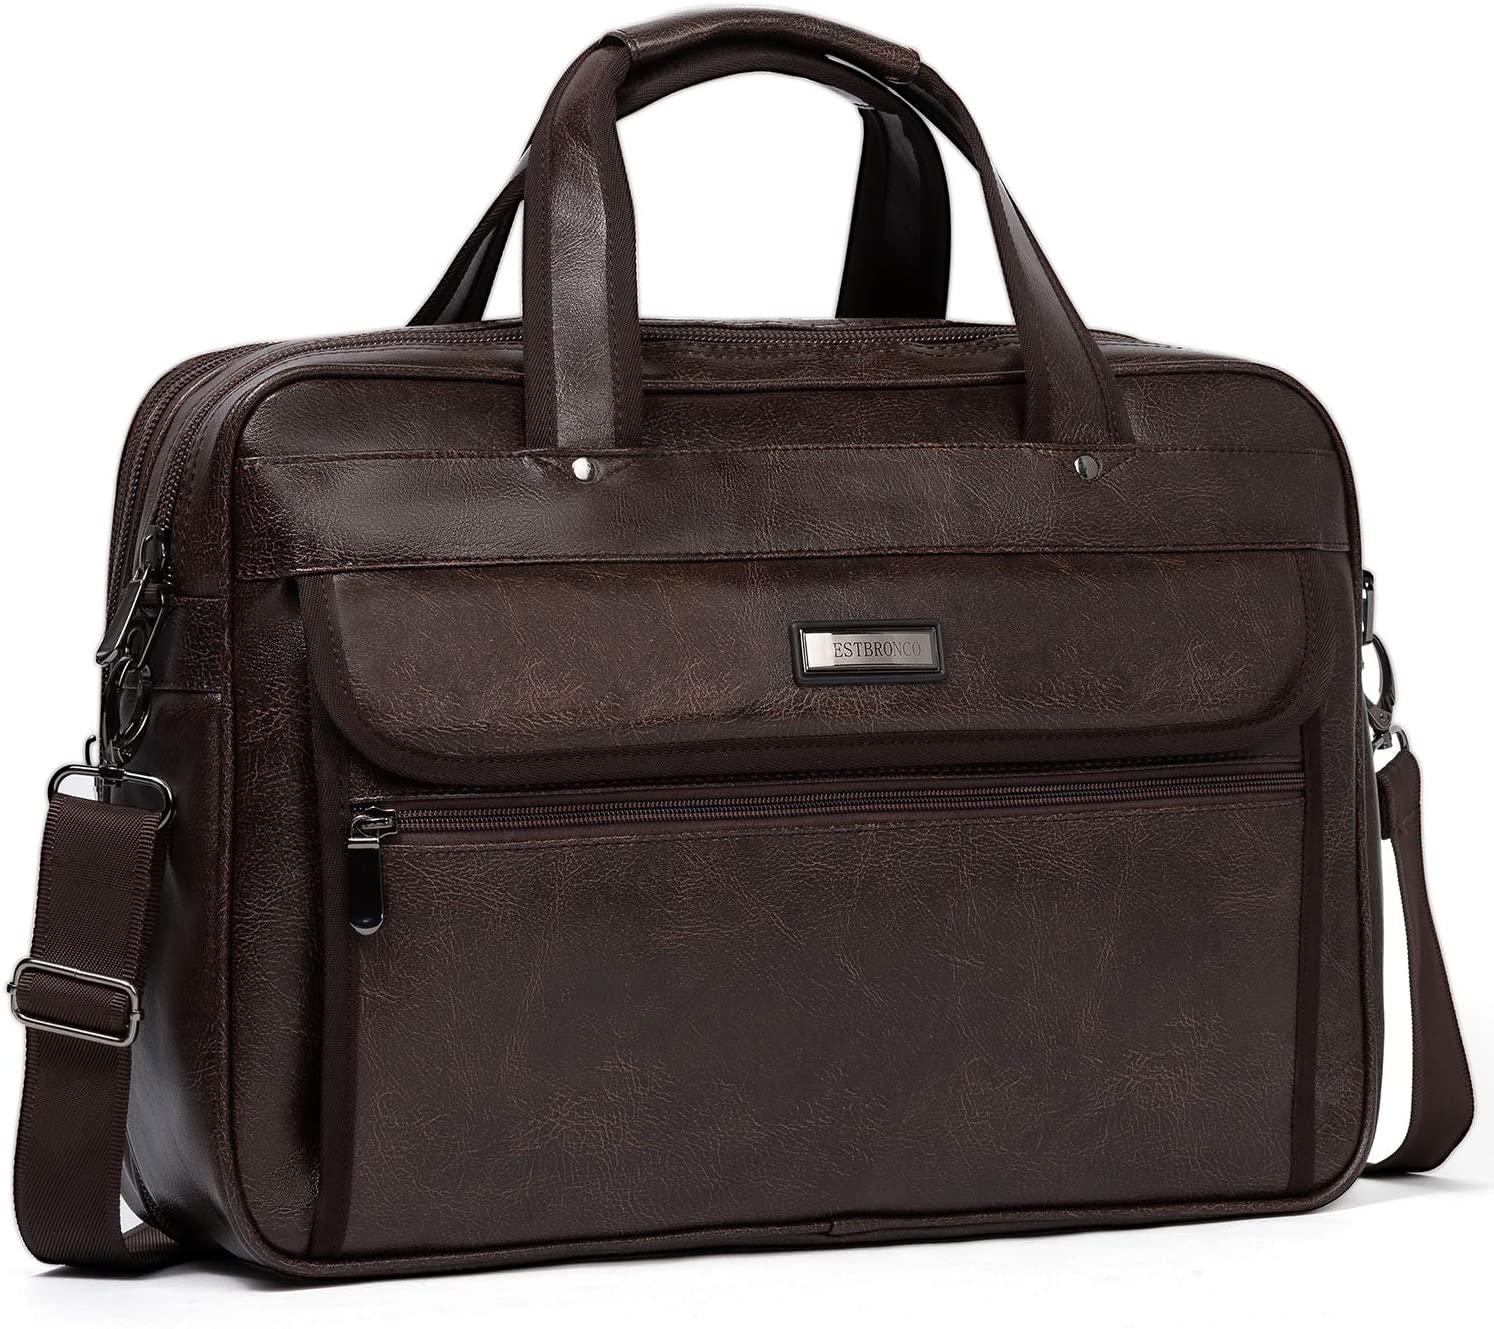 WESTBRONCO Leather Briefcase for Men Laptop Expandable Large Capacity Shoulder Messenger Bag for Men Travel Business College